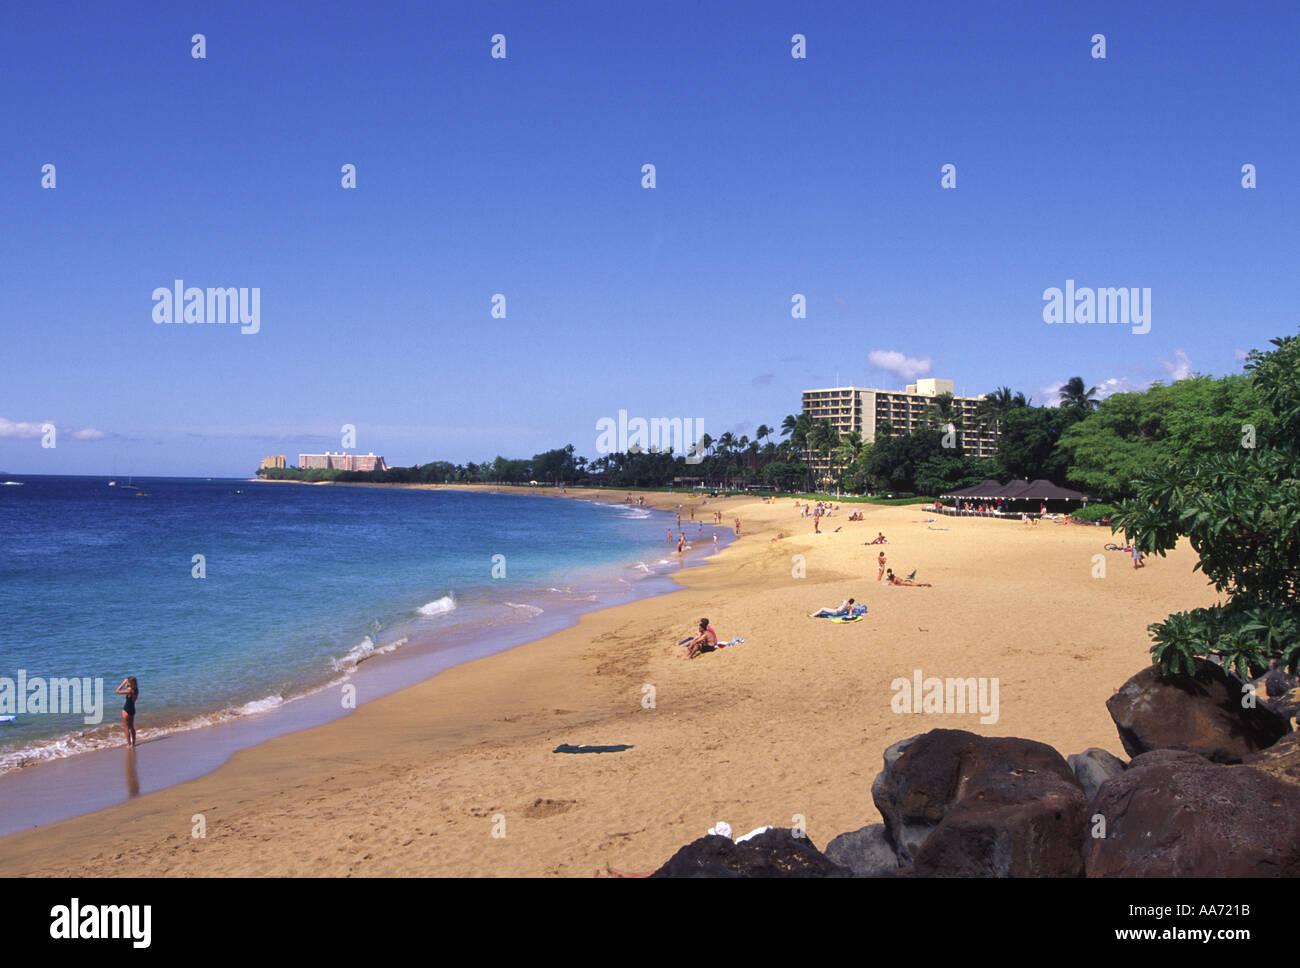 Kaanapali Beach Maui Hawaii Stock Photo 684571 Alamy